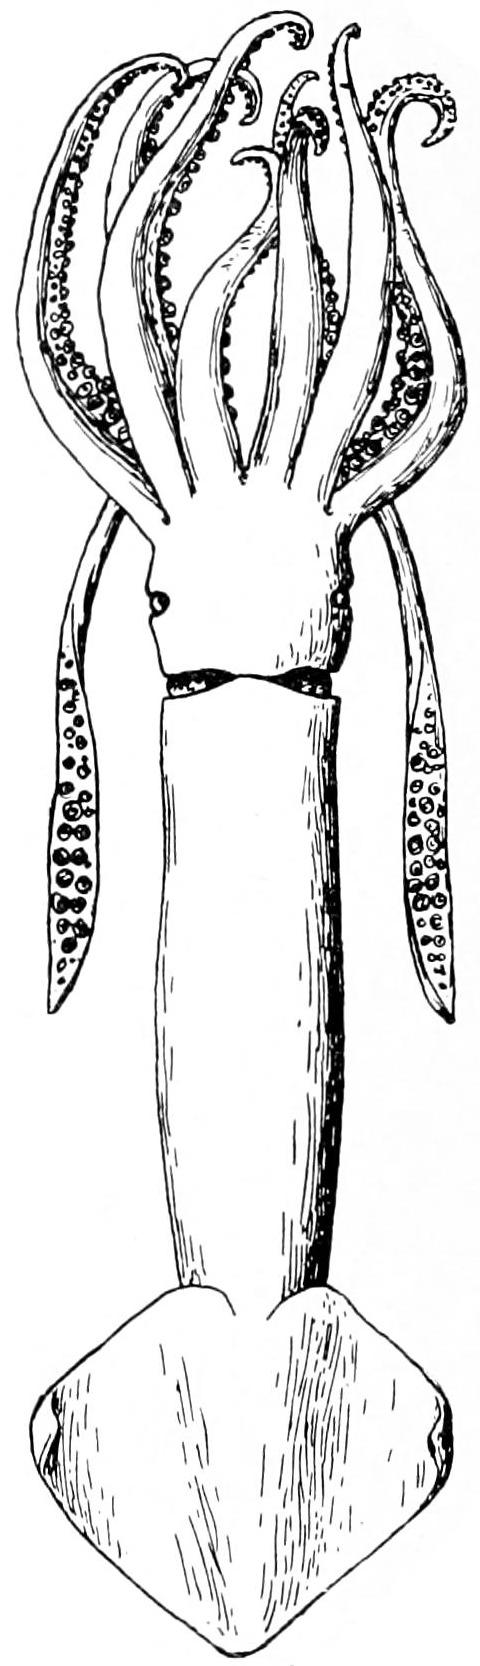 Image of Northern shortfin squid